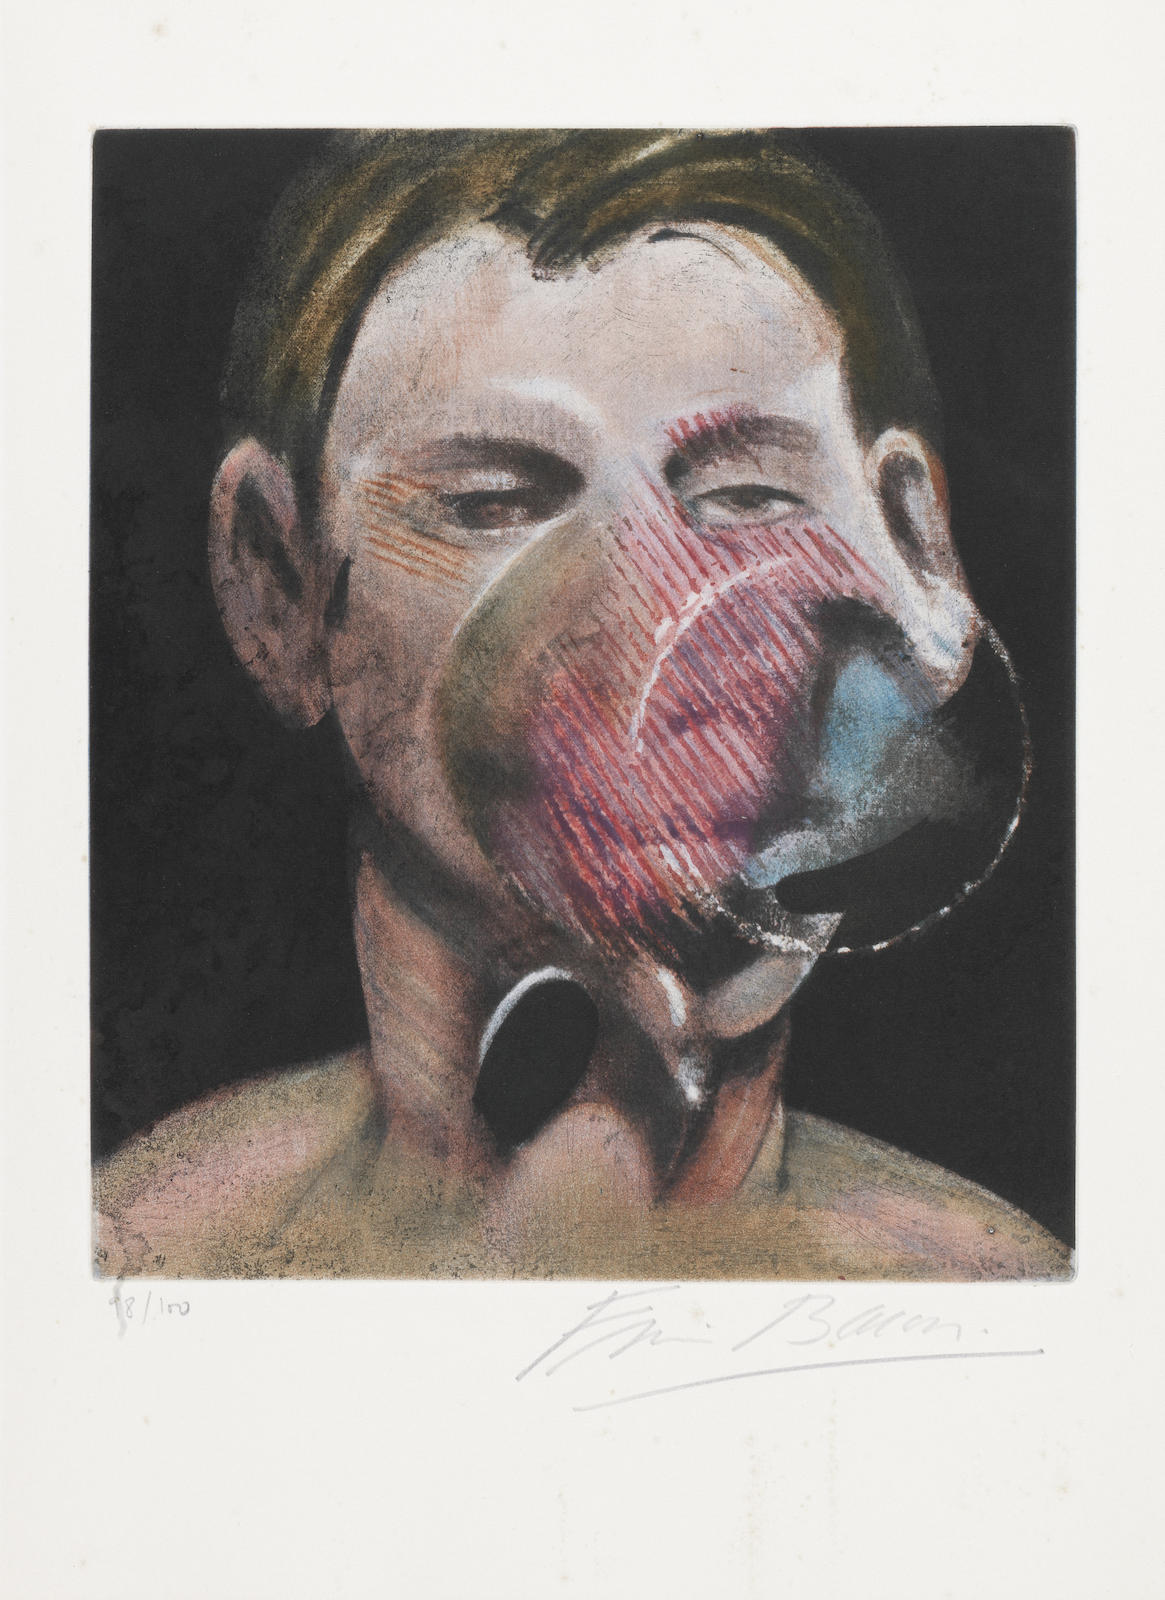 Francis Bacon-Henry Moore-Max Ernst-Vladimir Velickovic-Man Ray-Various Artists - Eddy Batache: La Mysticite Charnelle de Rene Crevel-1976